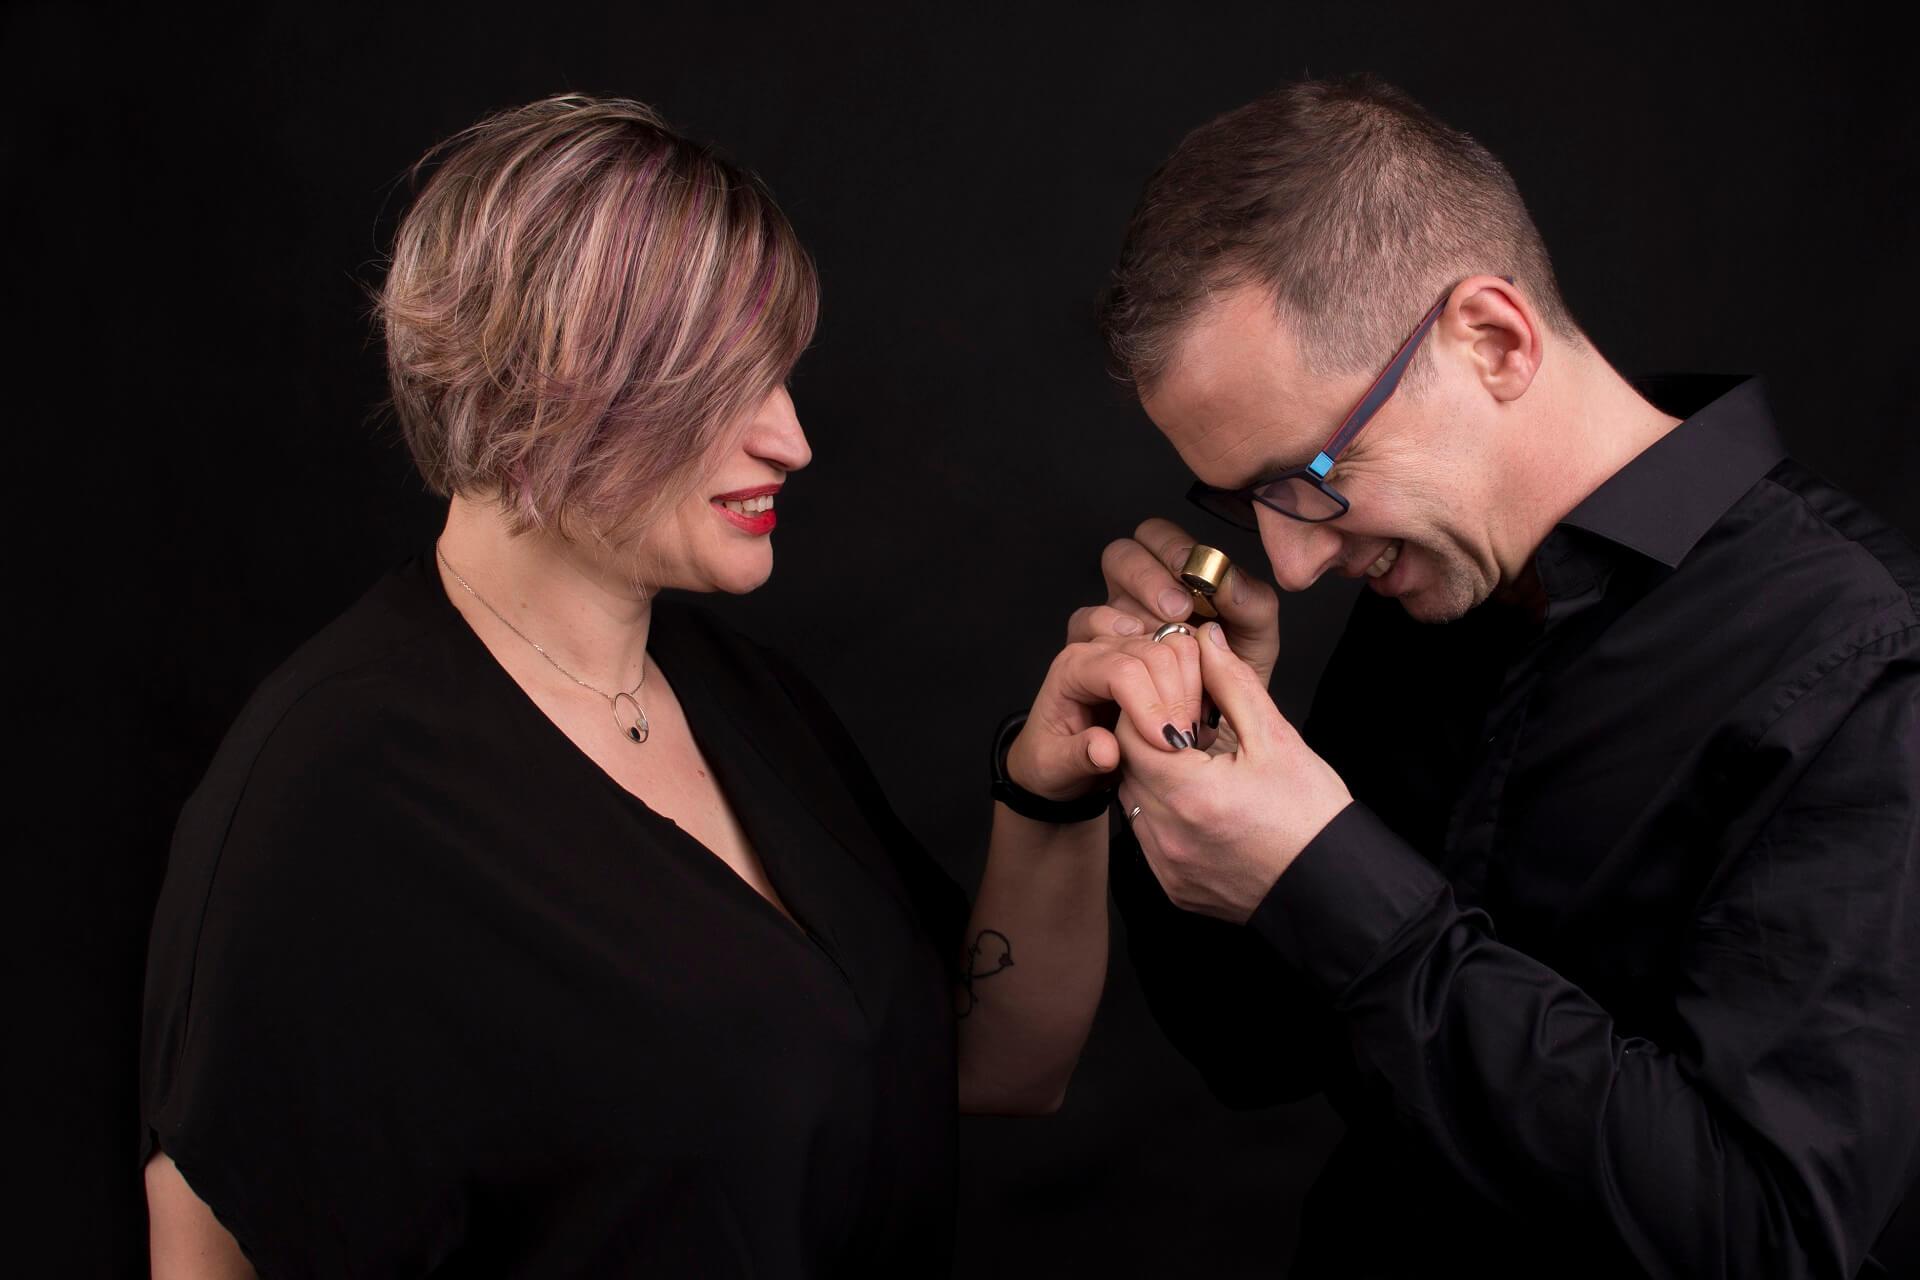 Design ékszerek - Rubinek házaspár